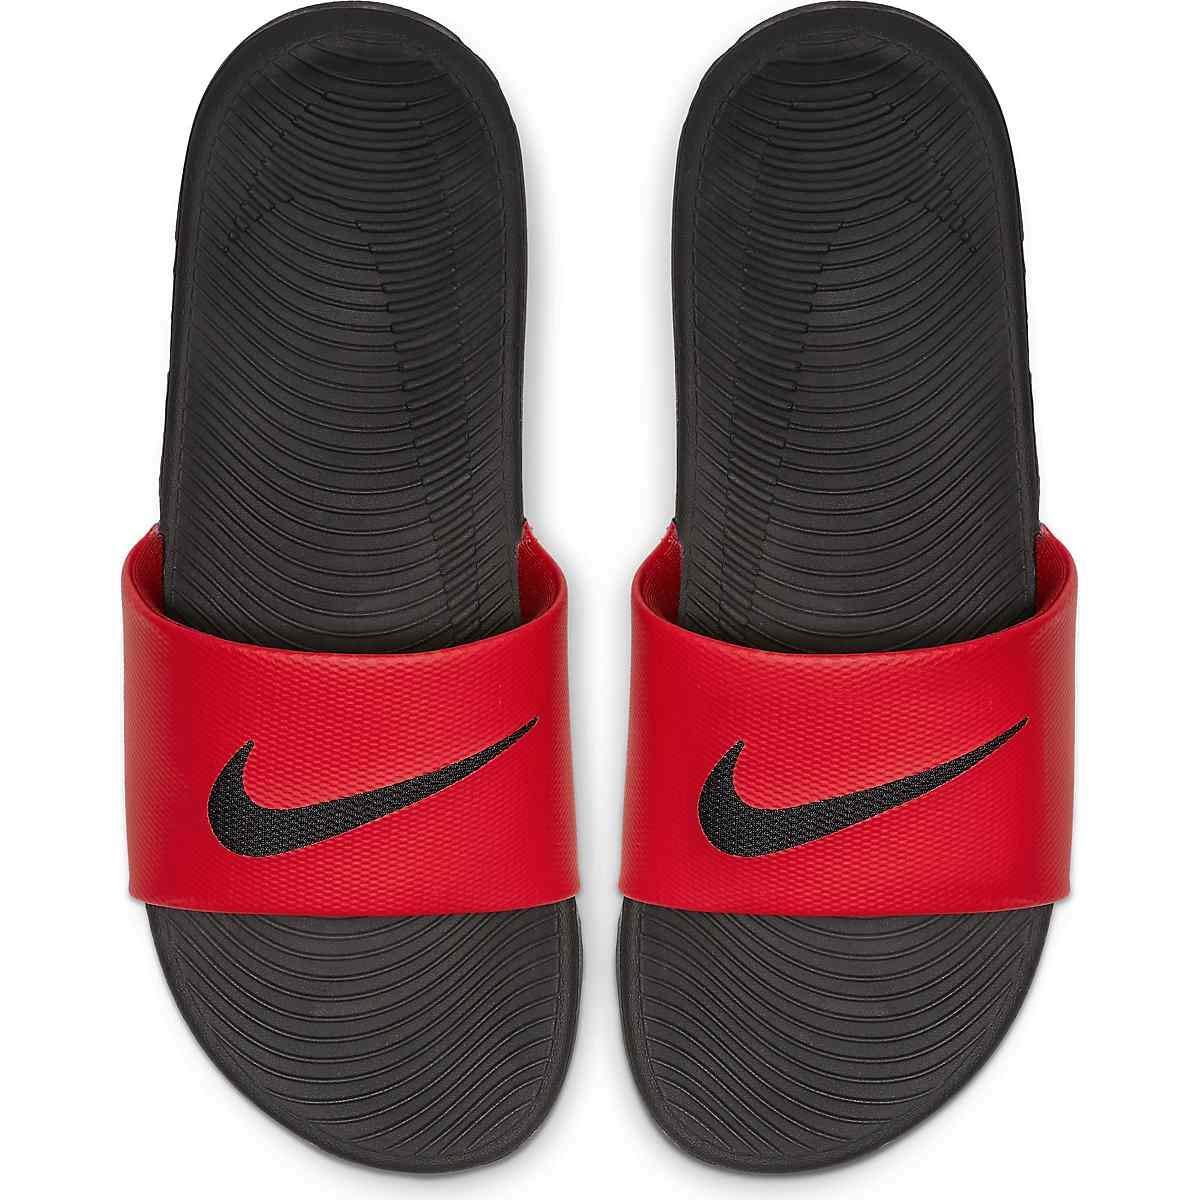 Nike Mens Kawa Slide Athletic Sandal, Red/Black Size 11 M US